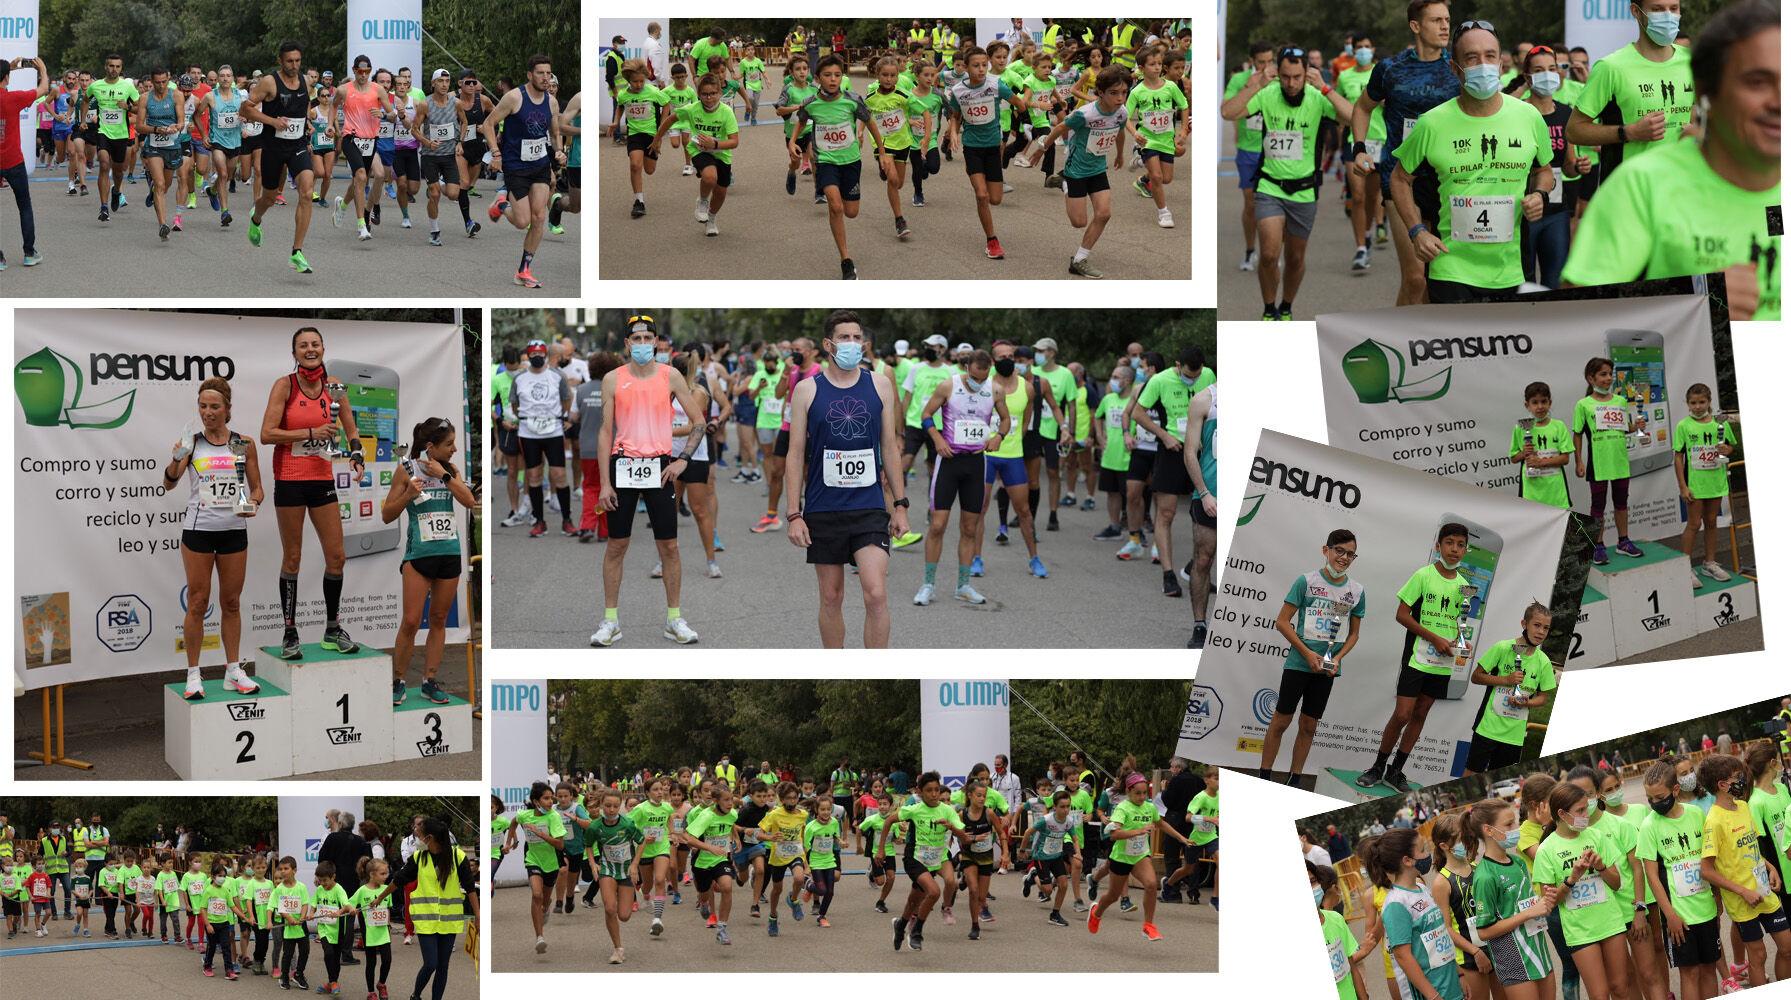 10K El Pilar – PENSUMO (III Savings Race)